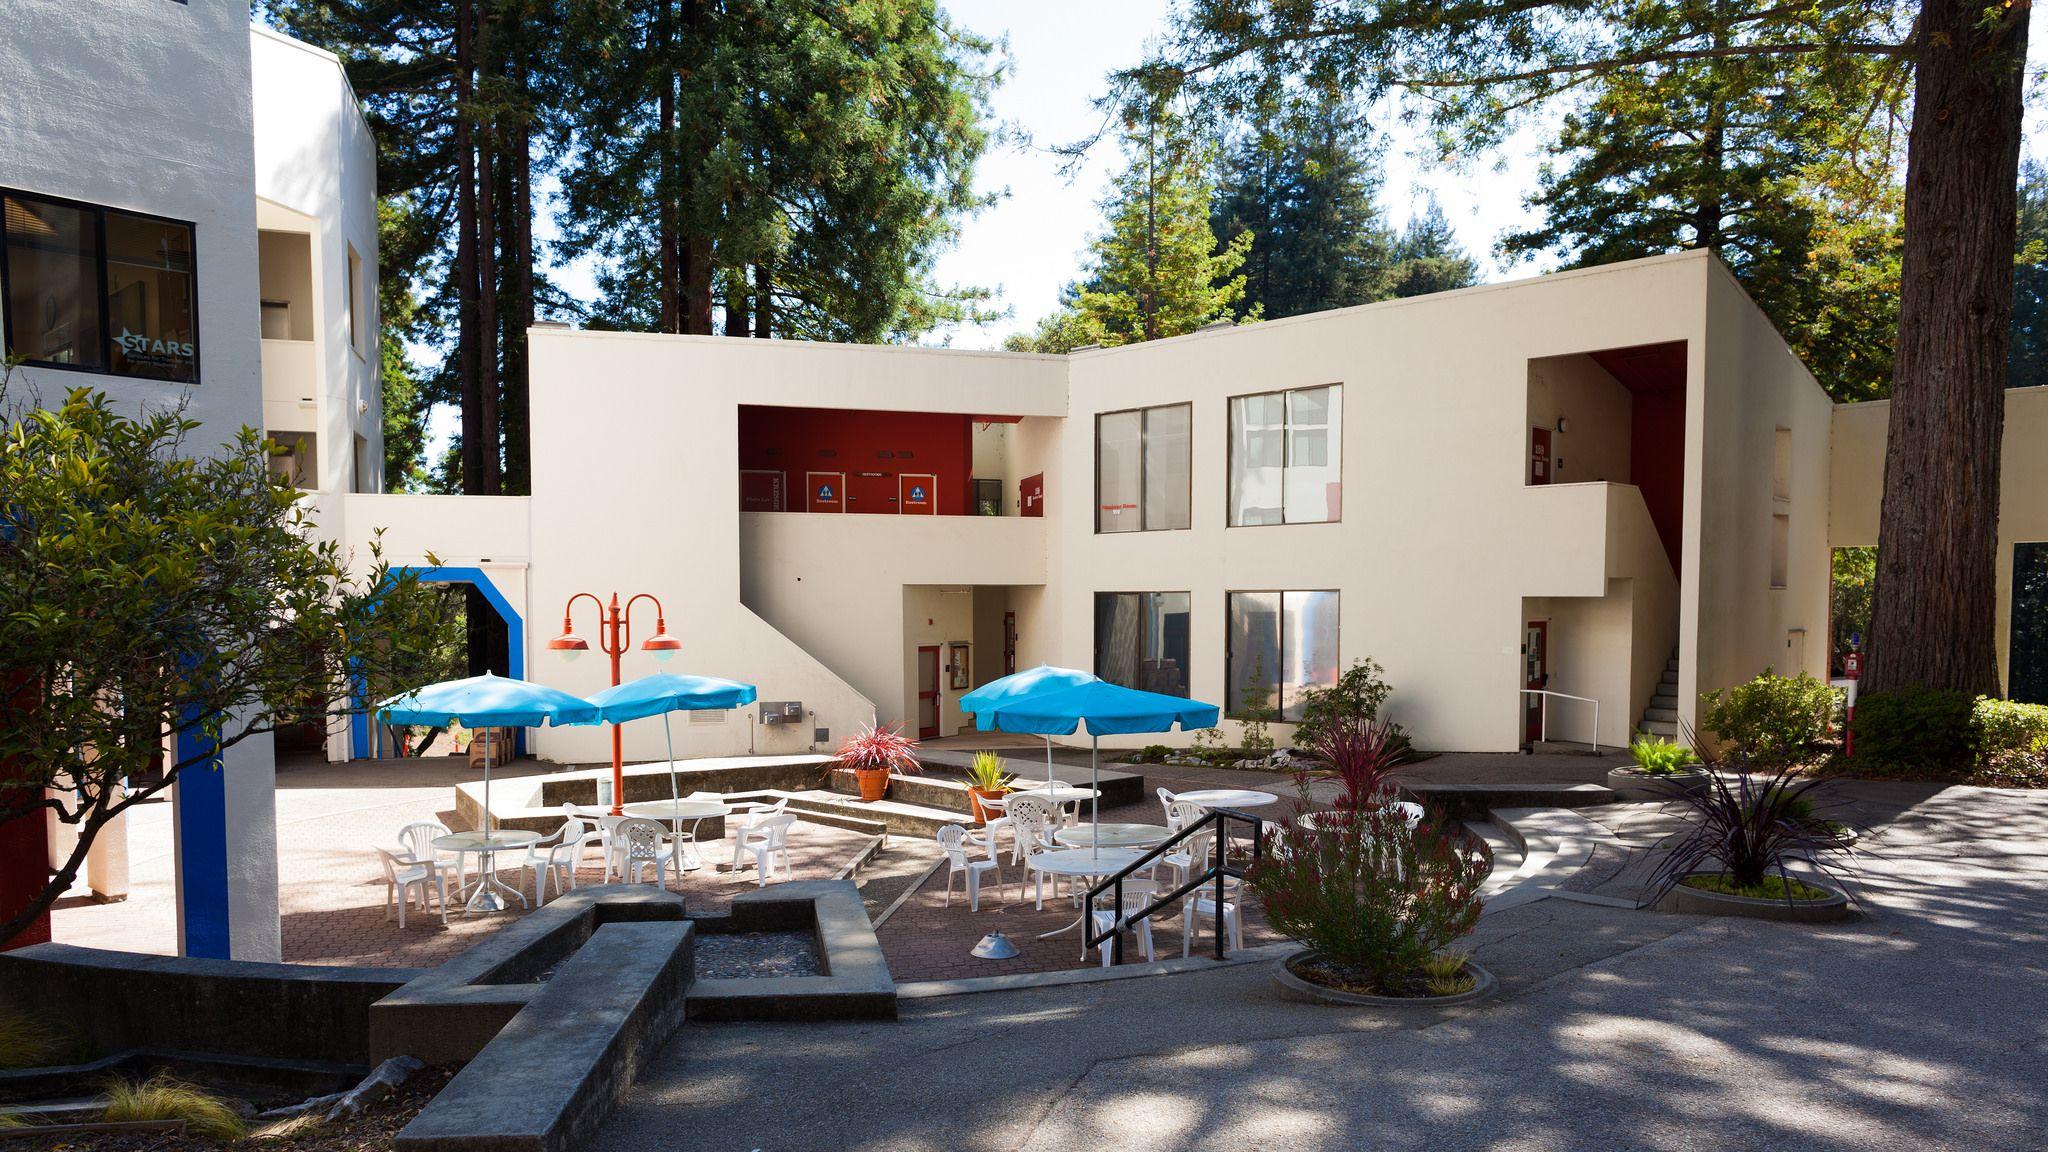 Santa Cruz Kresge College Santa Cruz California - Google maps kresgie college us santa cruz